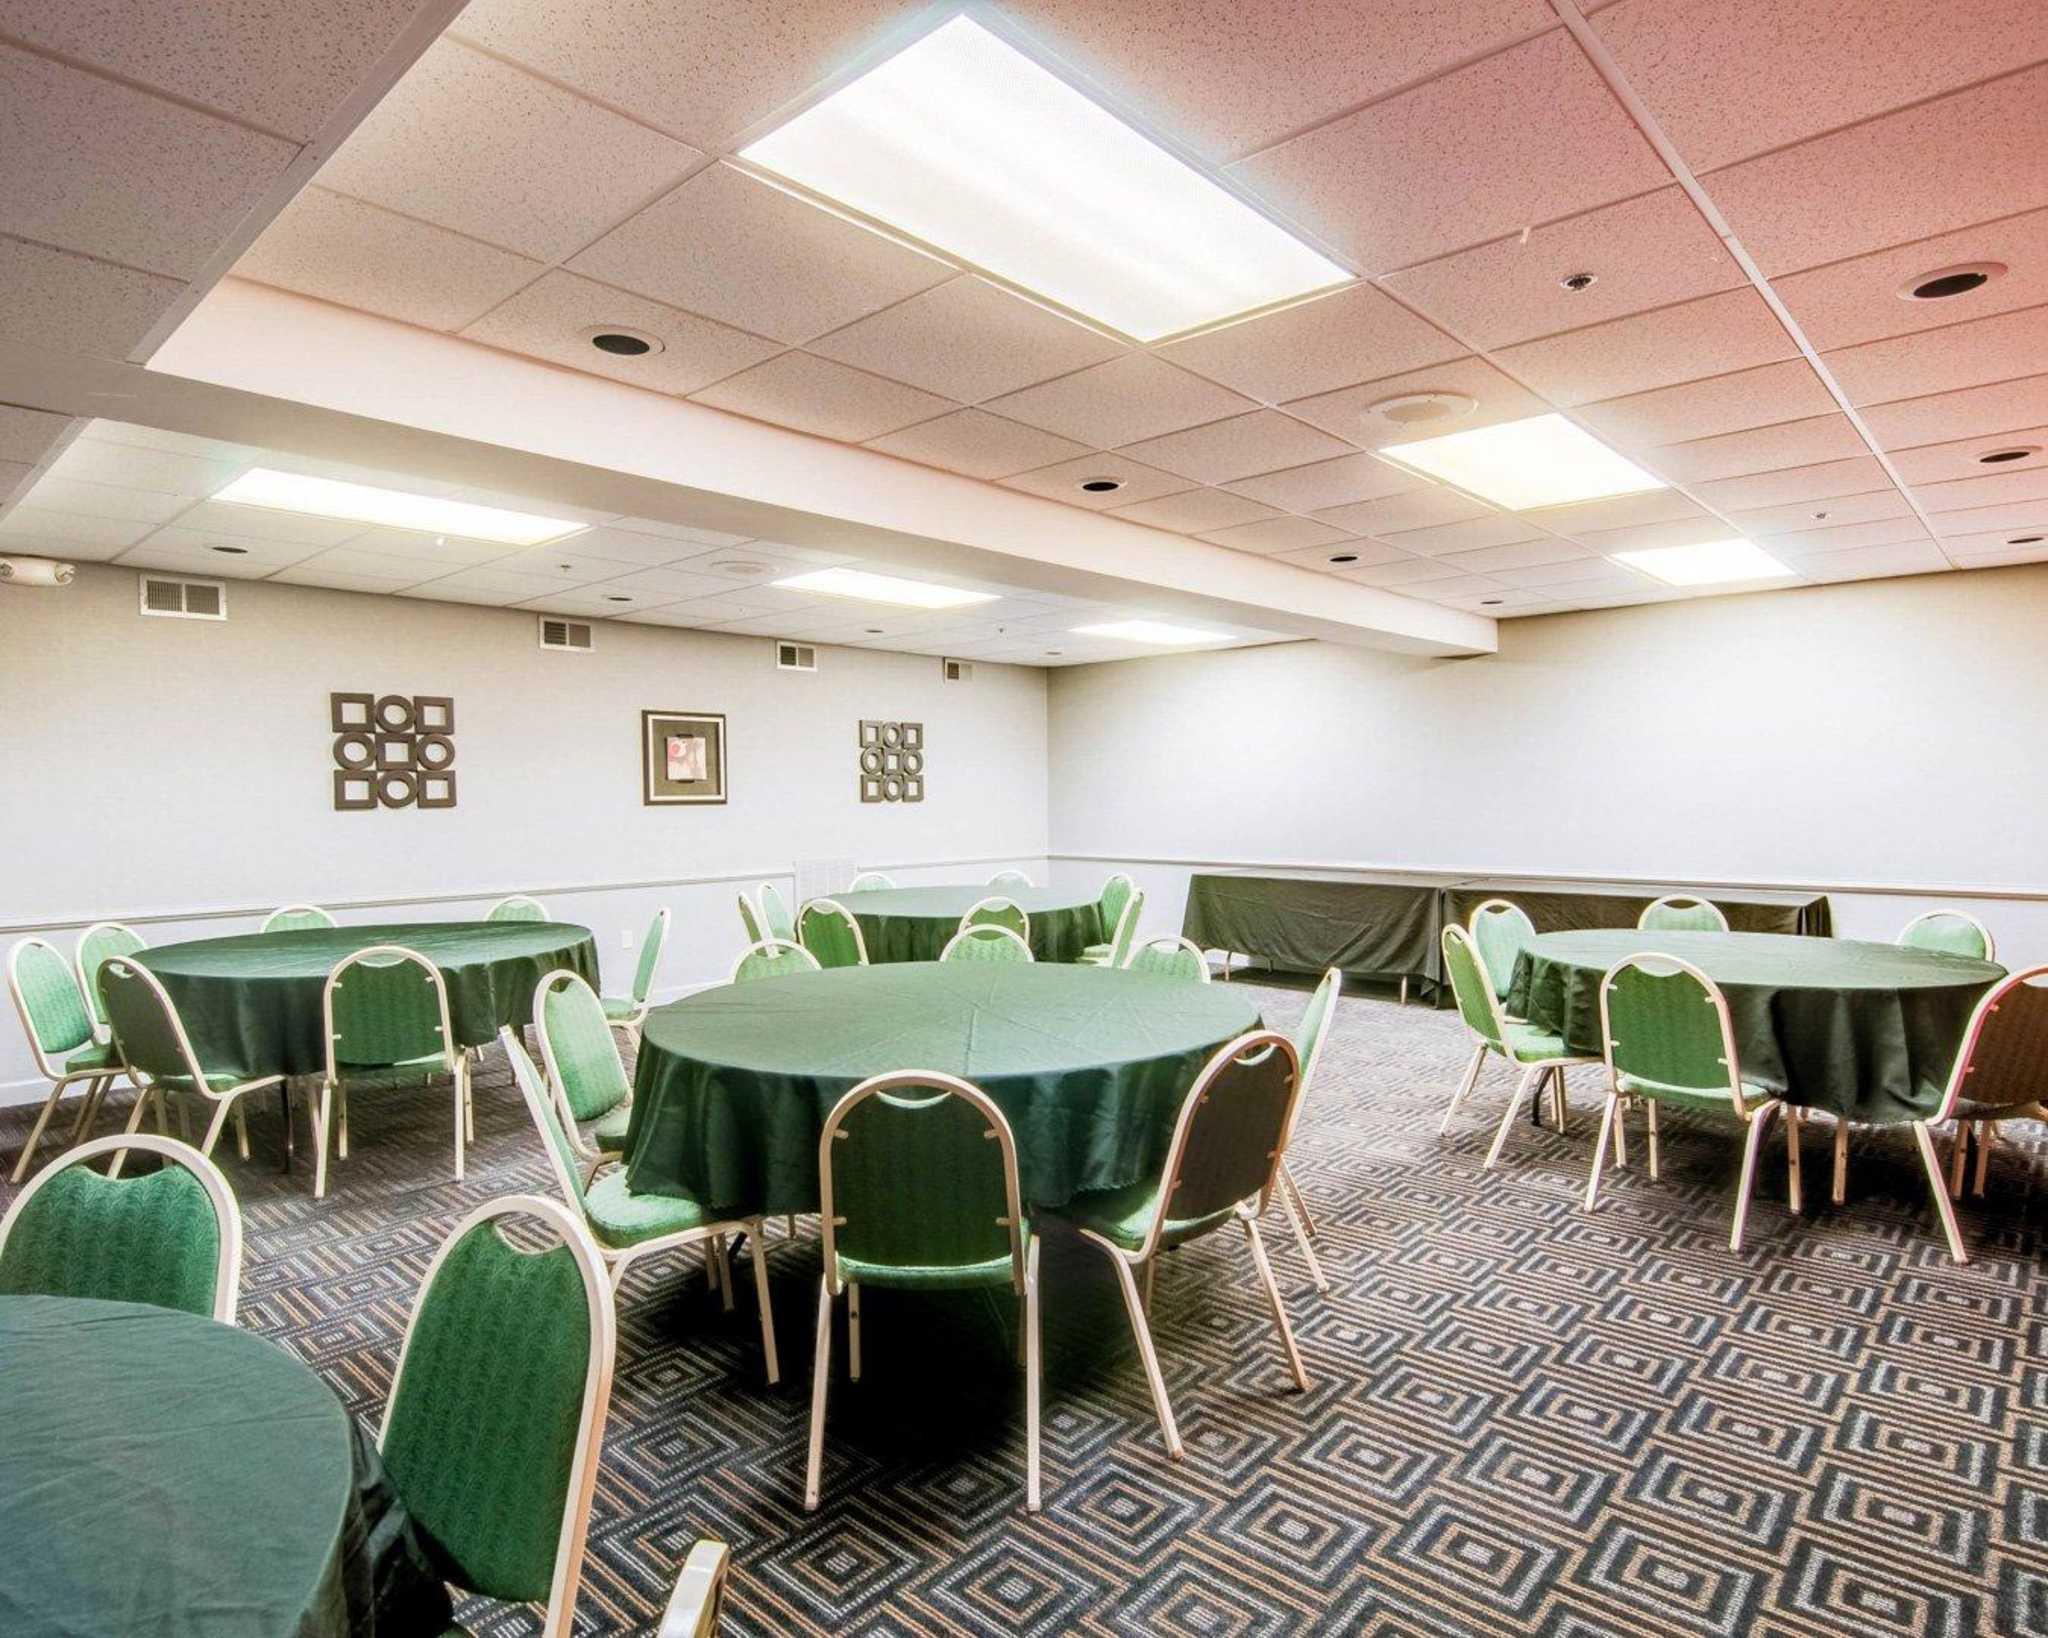 Comfort Suites Inn at Ridgewood Farm image 17